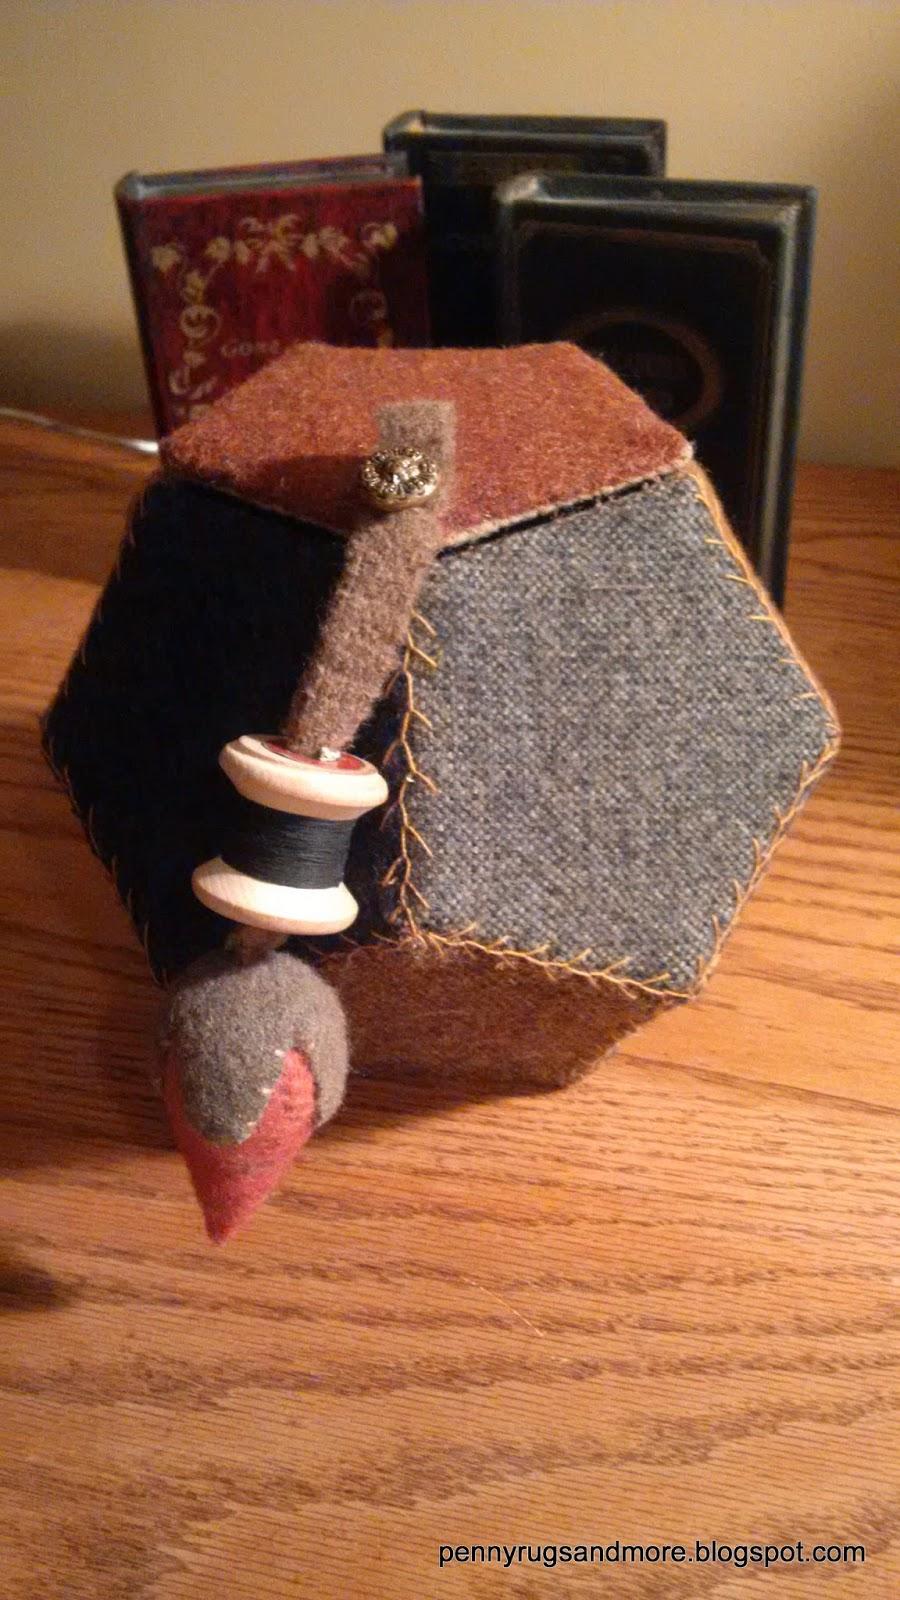 pennyrugsandmore.blogspot.com